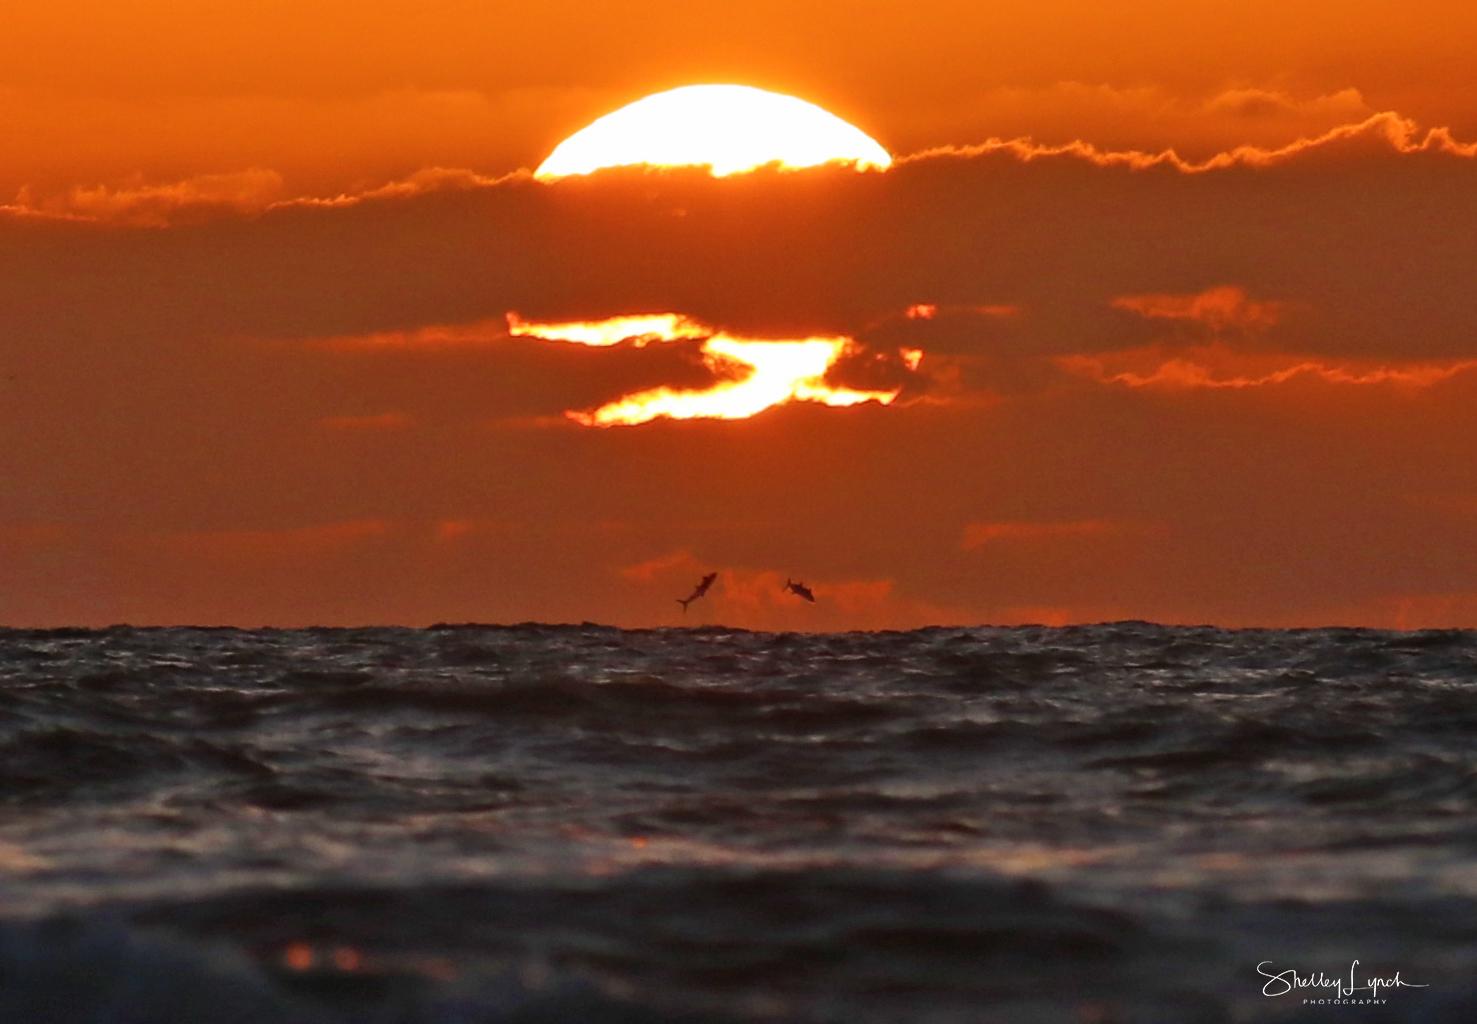 Fish jumping below the sun